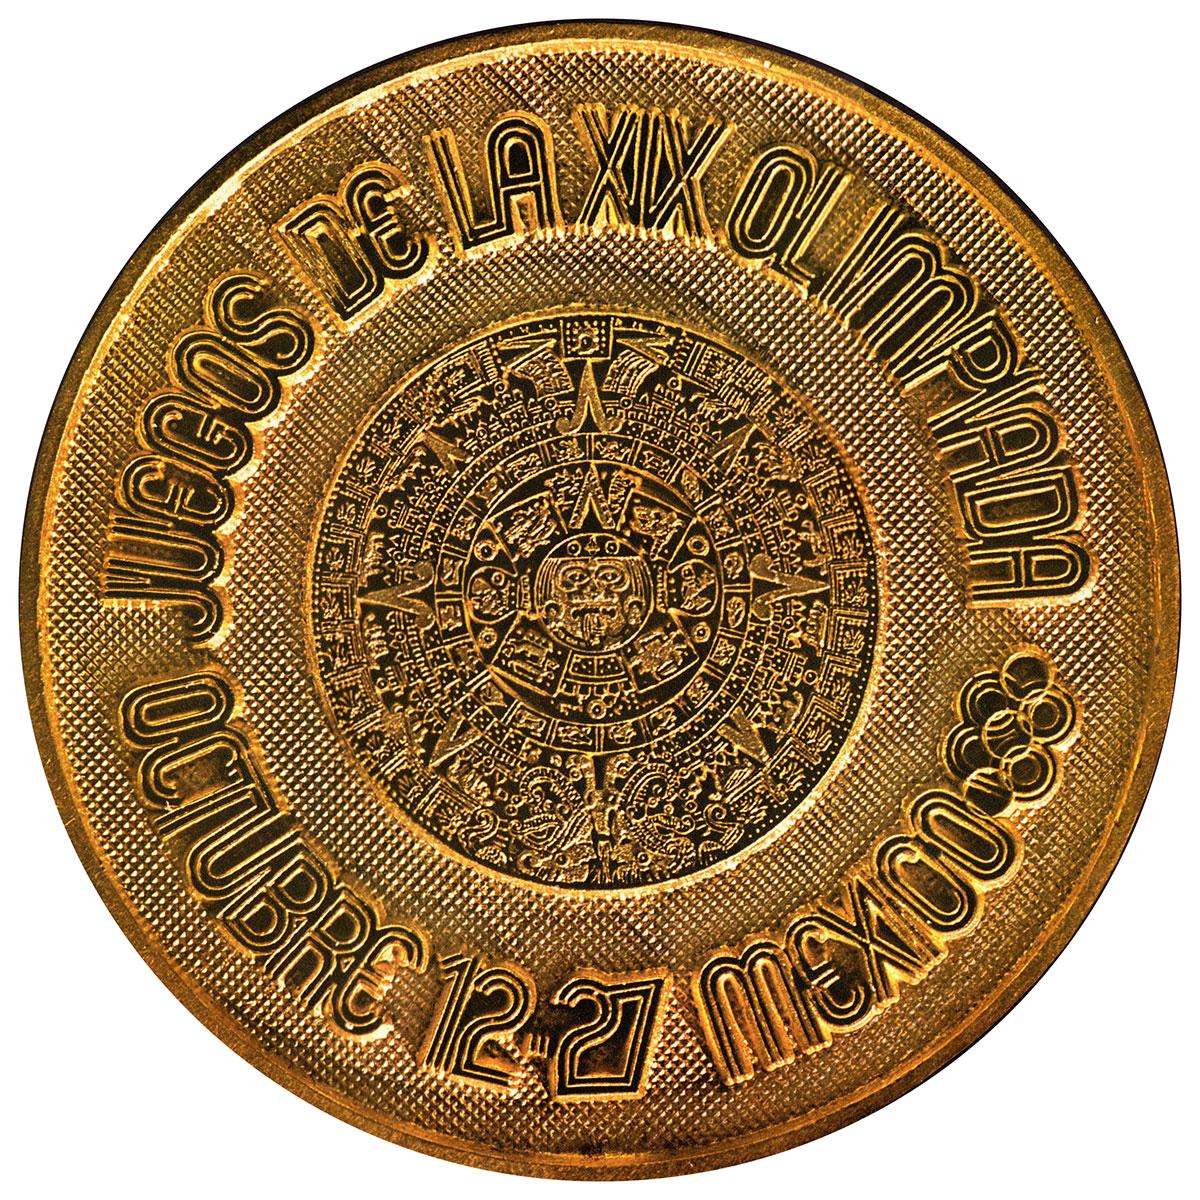 Wyman_GoldCoin'68